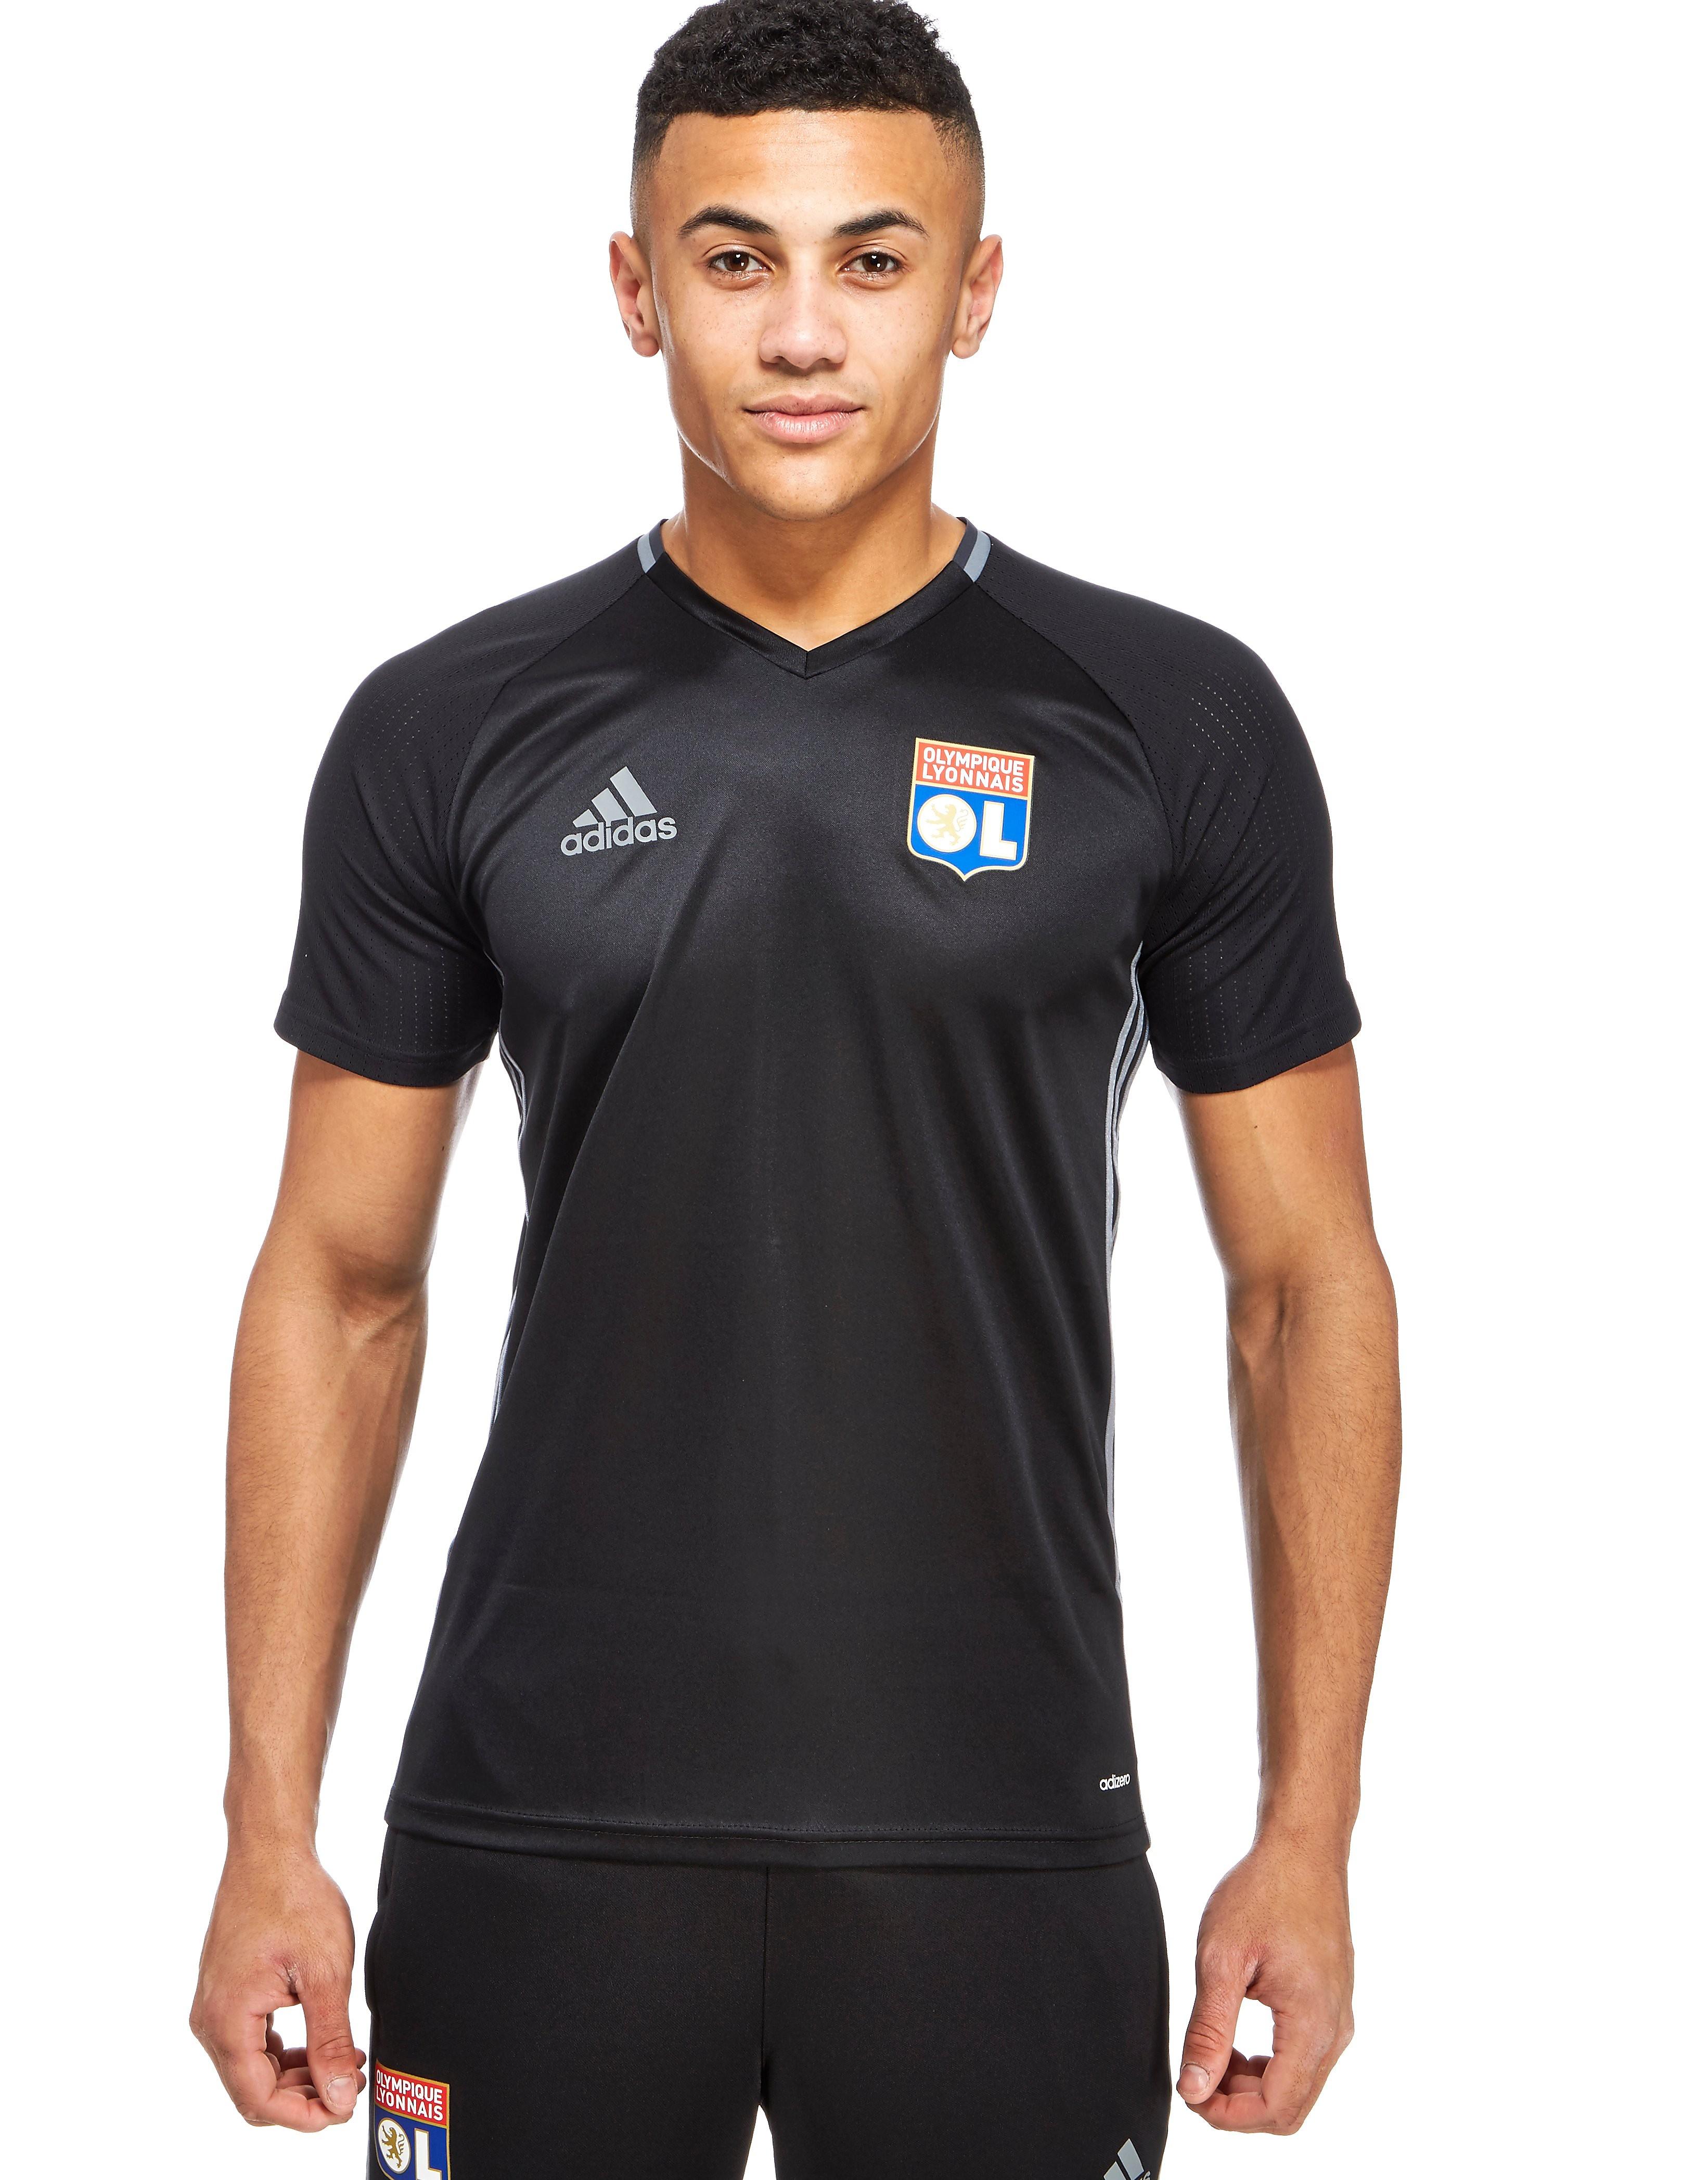 adidas Olympique Lyon 2016/17 Training Shirt